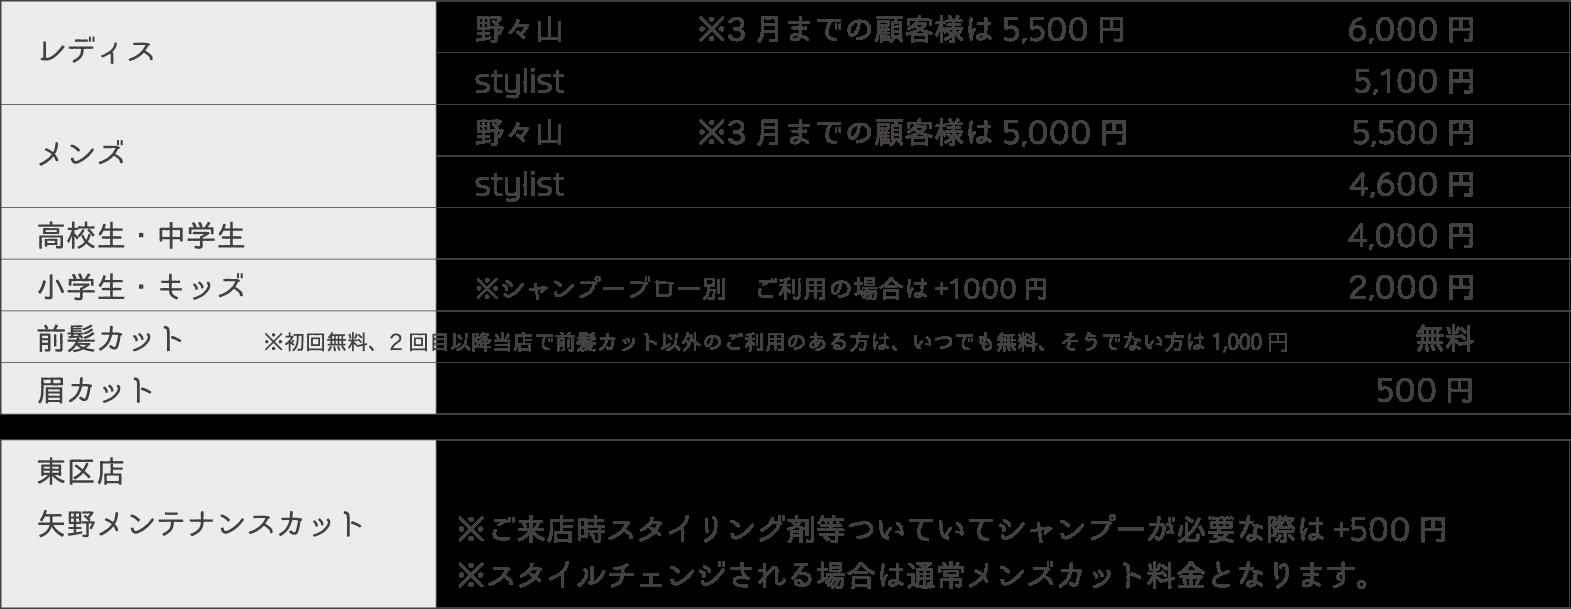 faith_menu_2018